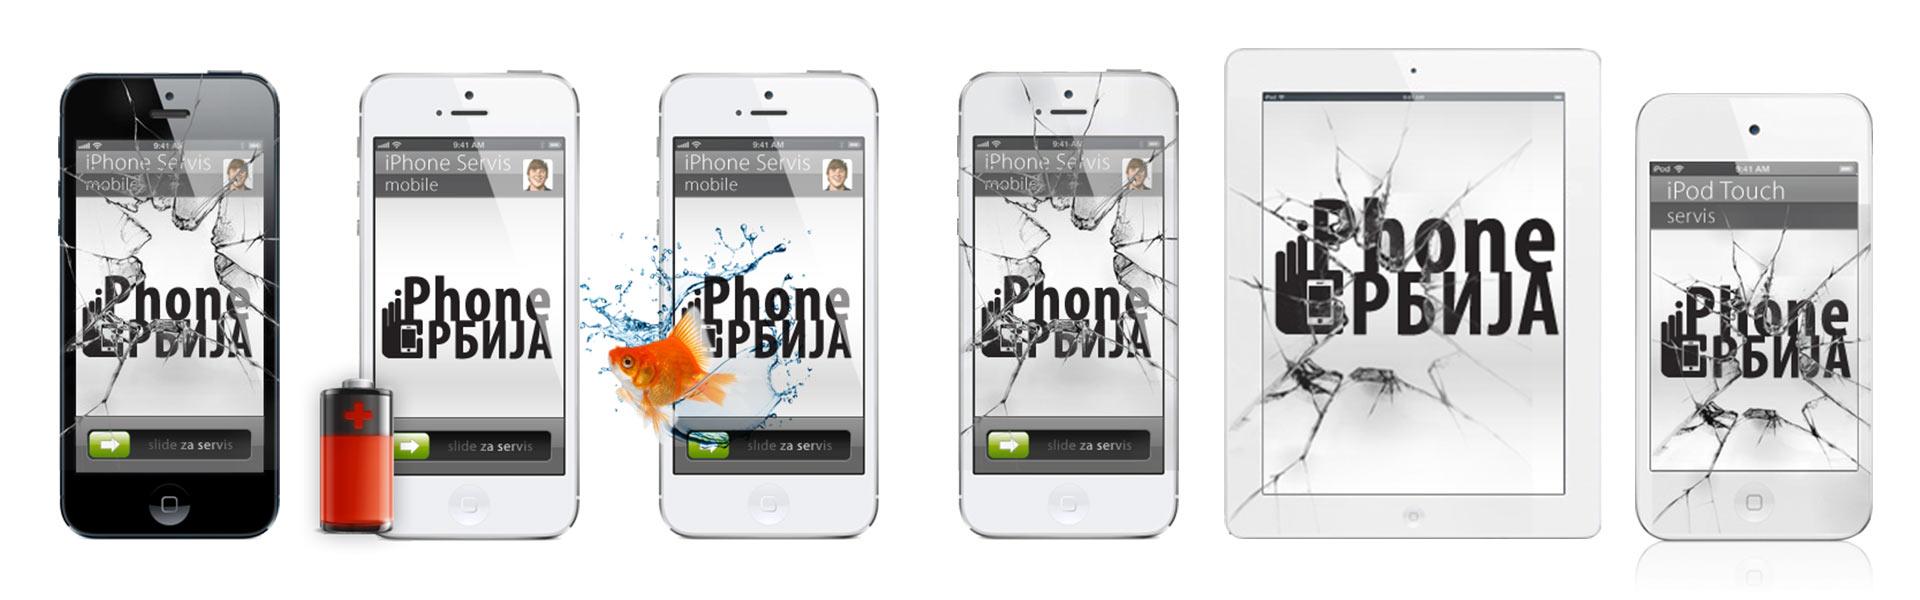 iPhone Servis Usluge